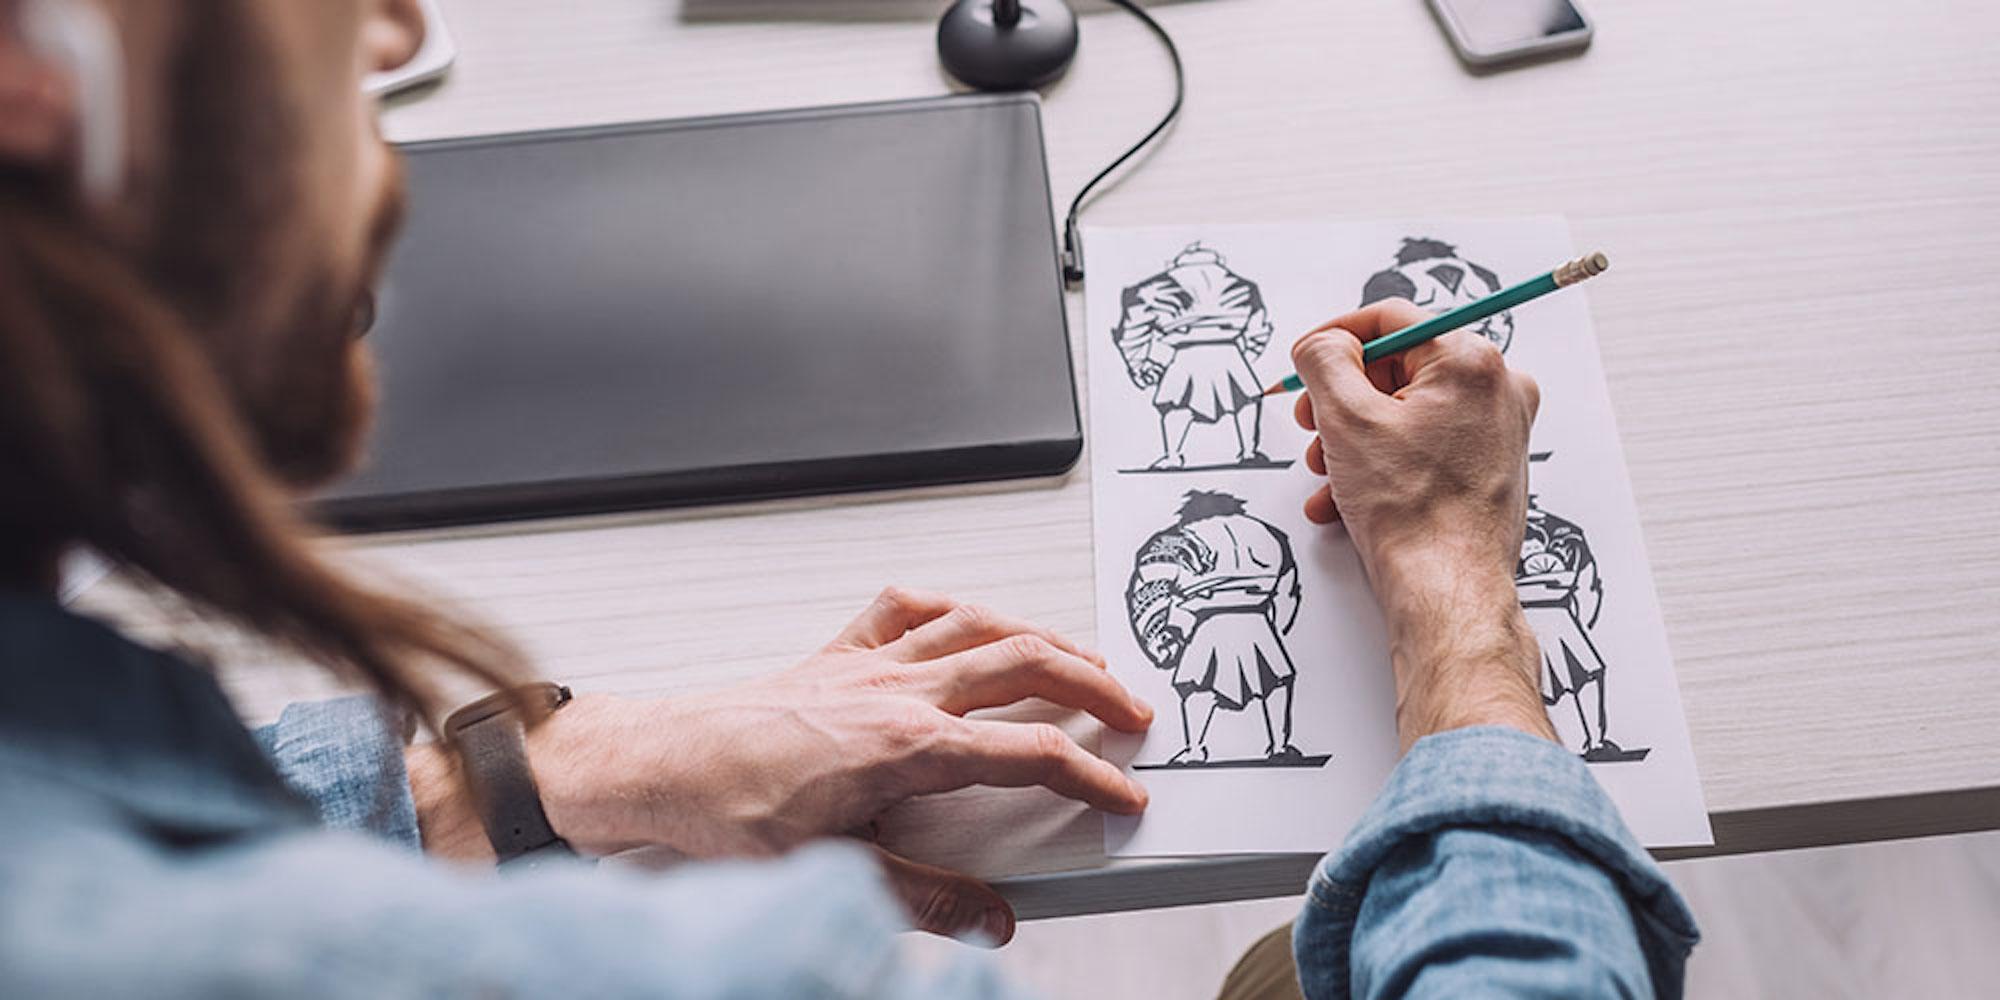 Ultimate Cartoon Animator 4 can turn even non-artists into accomplished  animators